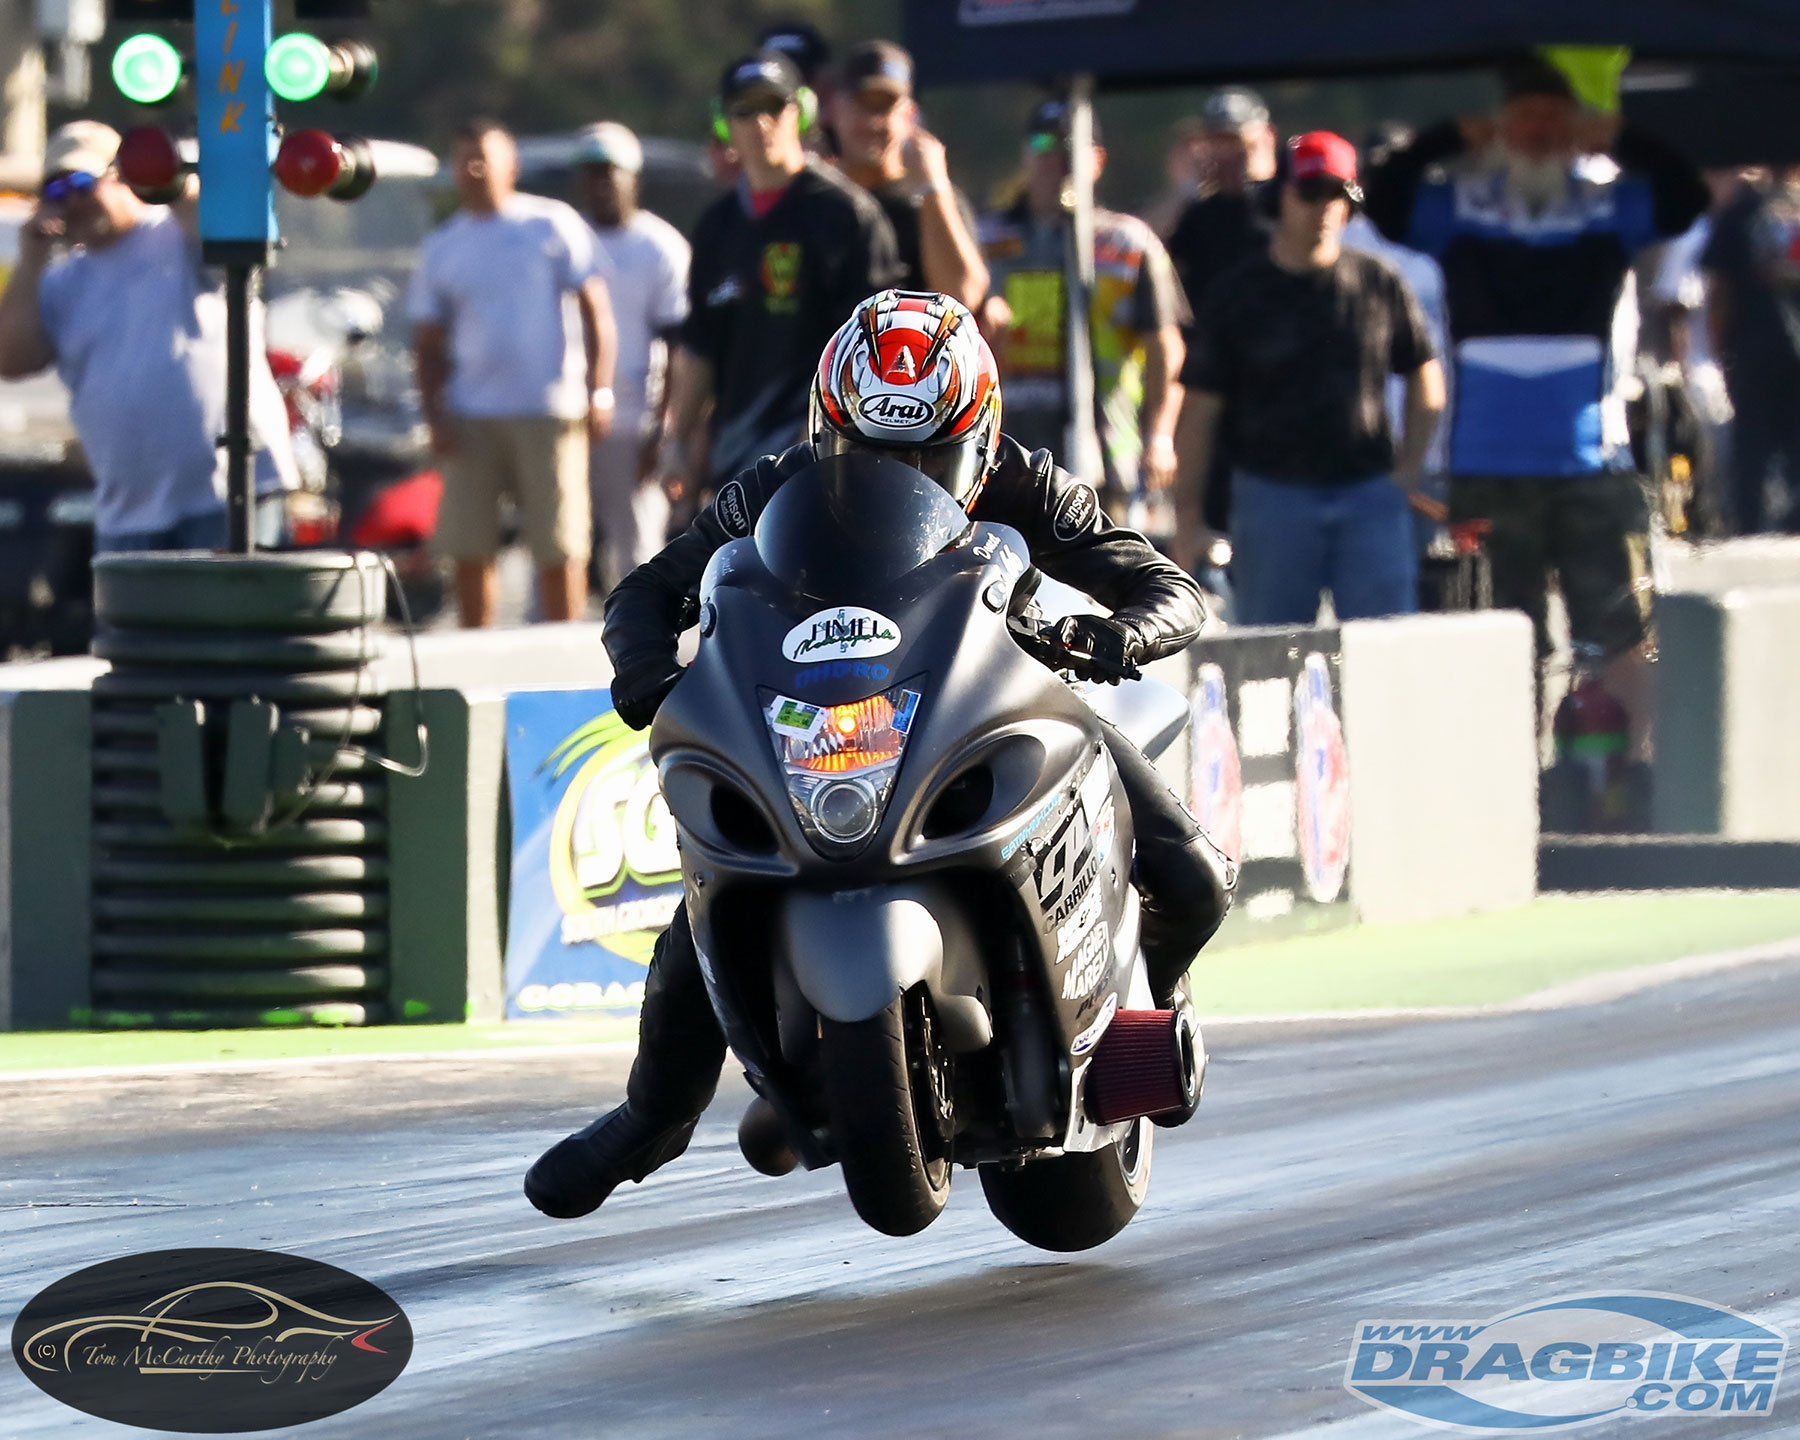 Pro Street Motorcycle drag racing